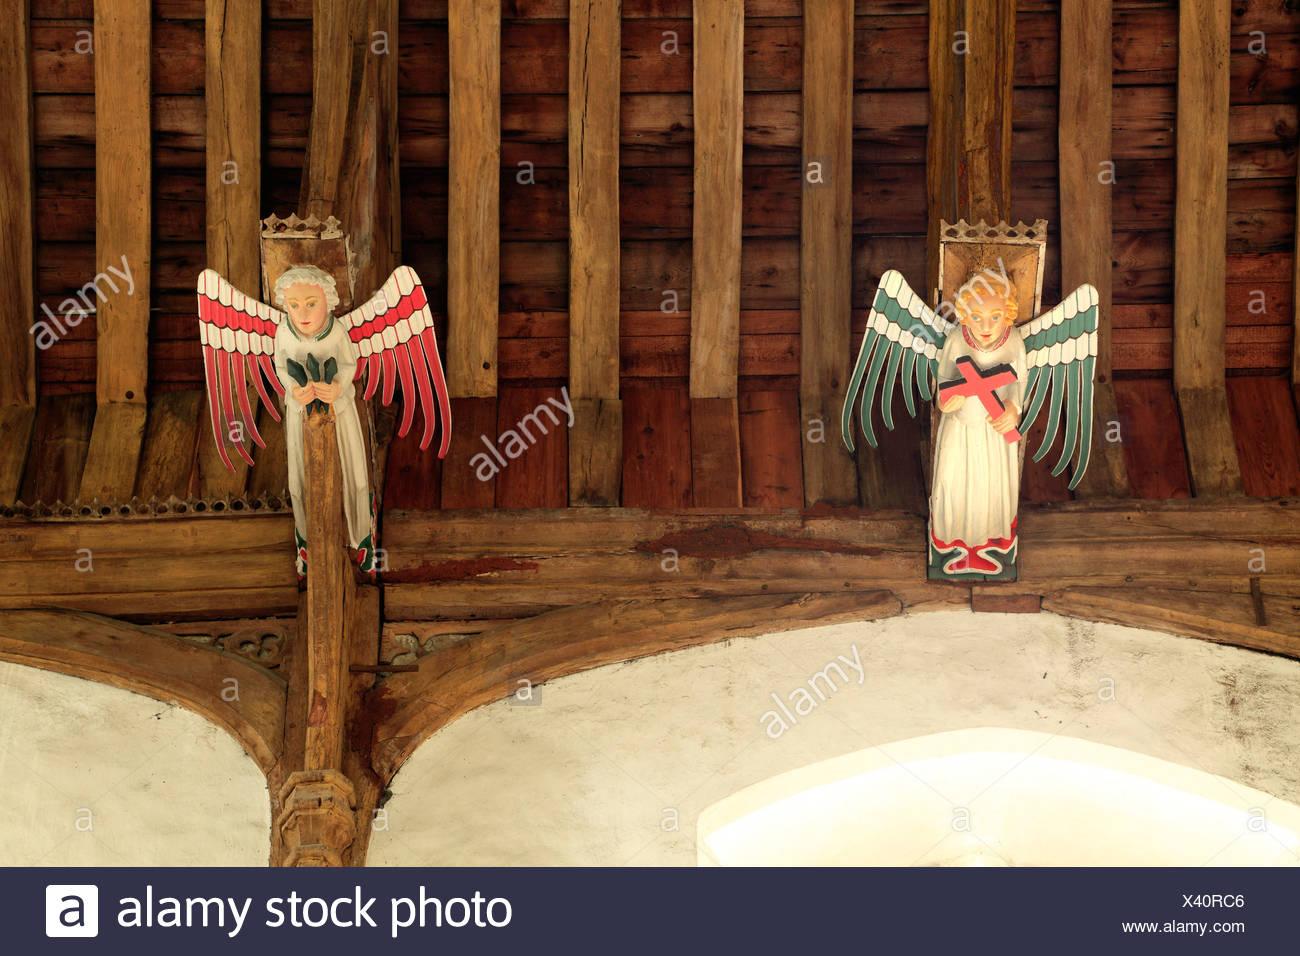 South Creake Kirche, mittelalterliche Hammerbalken Dach, hammer Engel Engel, Norfolk, England, Dächer Beam Balken Stockbild